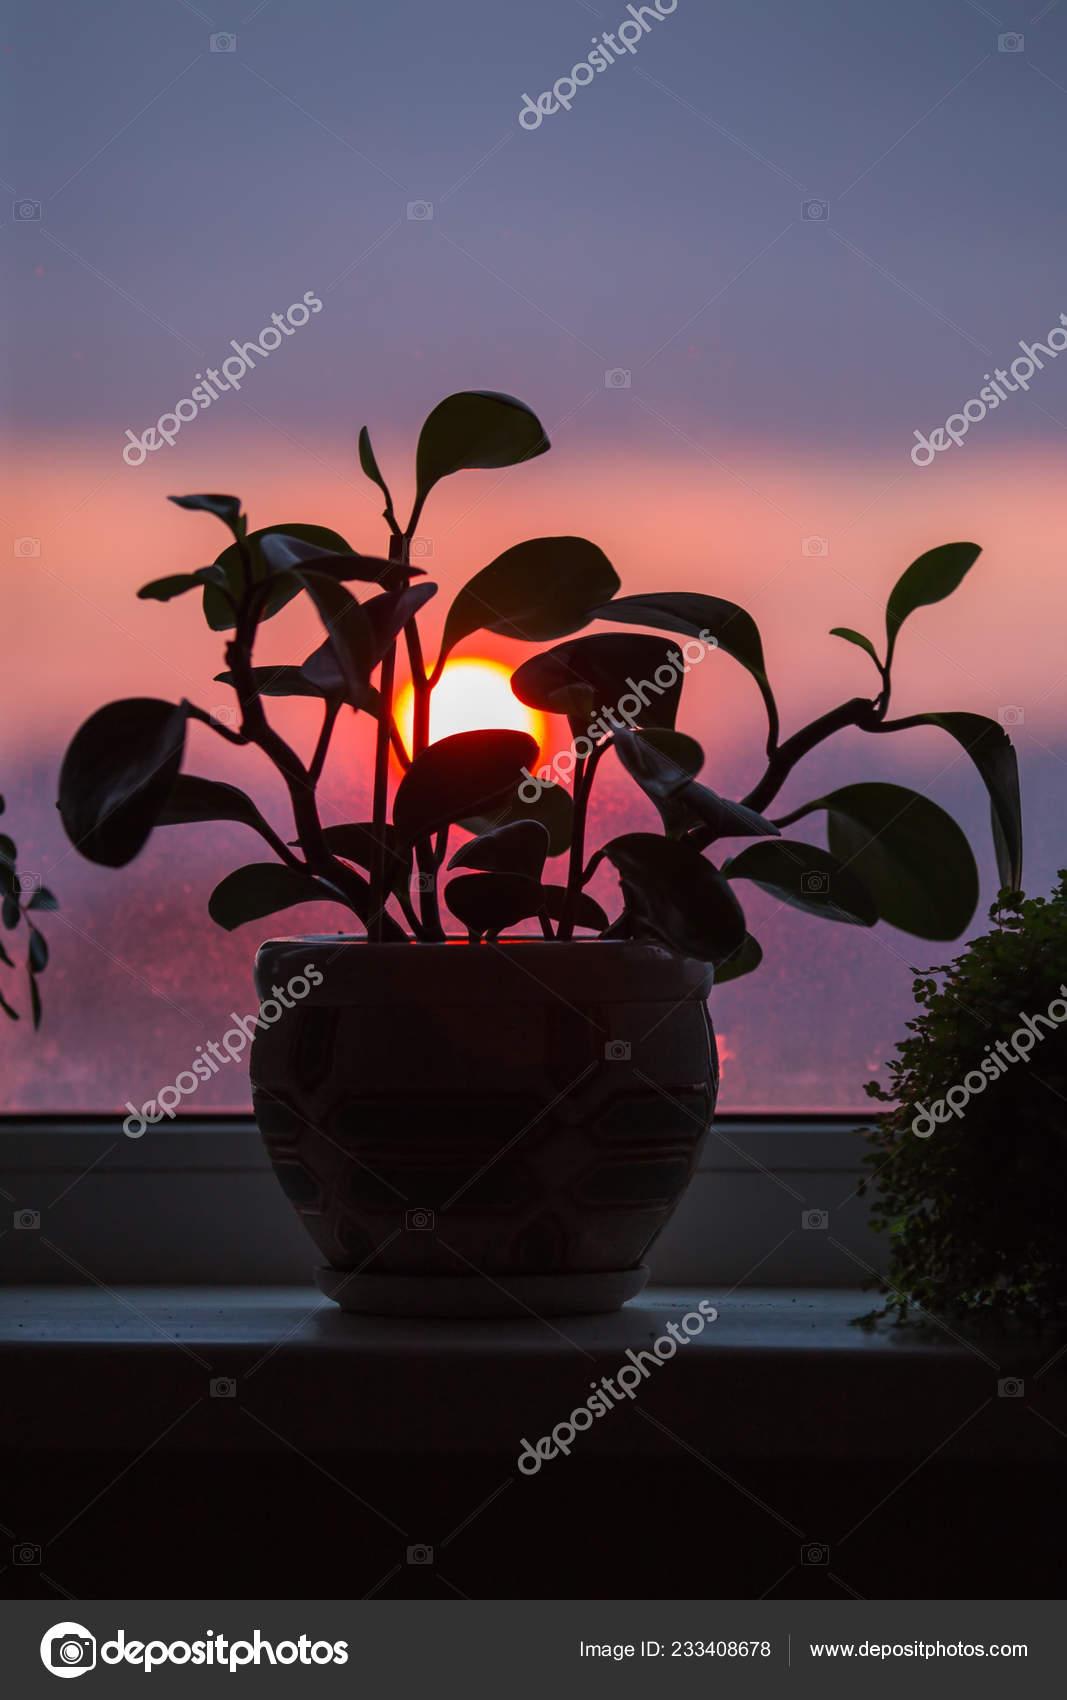 https://st4.depositphotos.com/14740706/23340/i/1600/depositphotos_233408678-stock-photo-house-plant-pot-stands-window.jpg